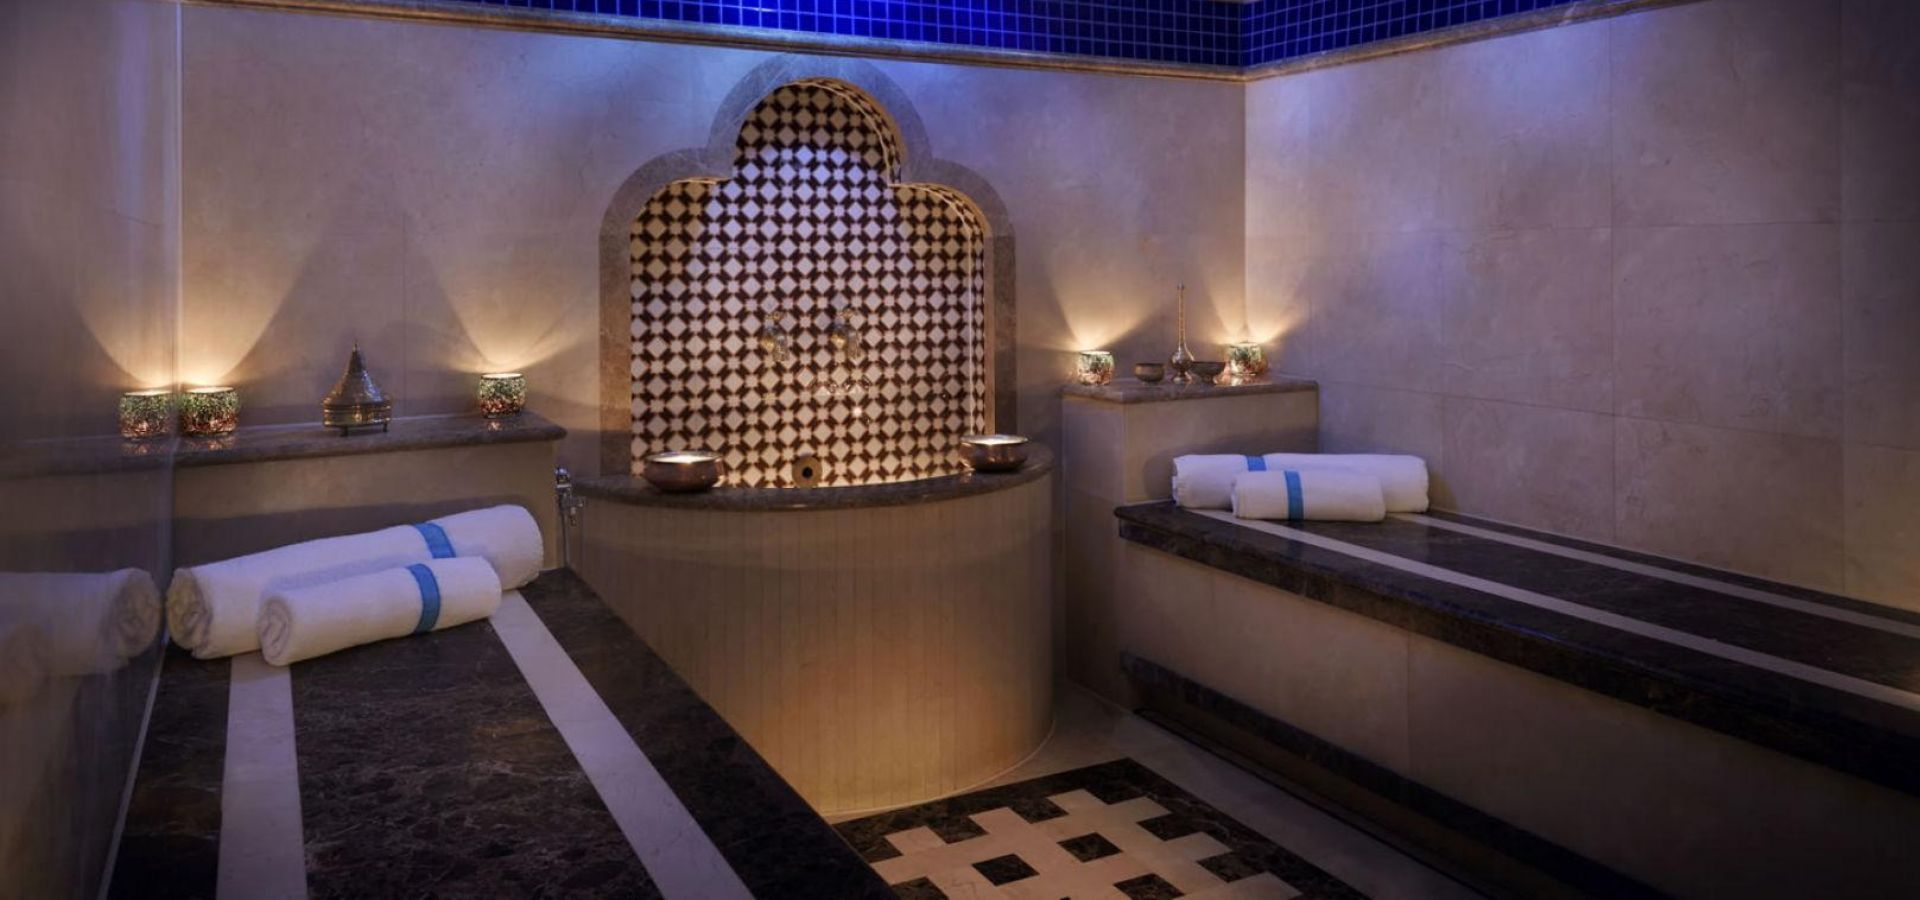 Review One Only Royal Mirage Spa Dubai Moroccan Massage Spa Hair And Nail Salon